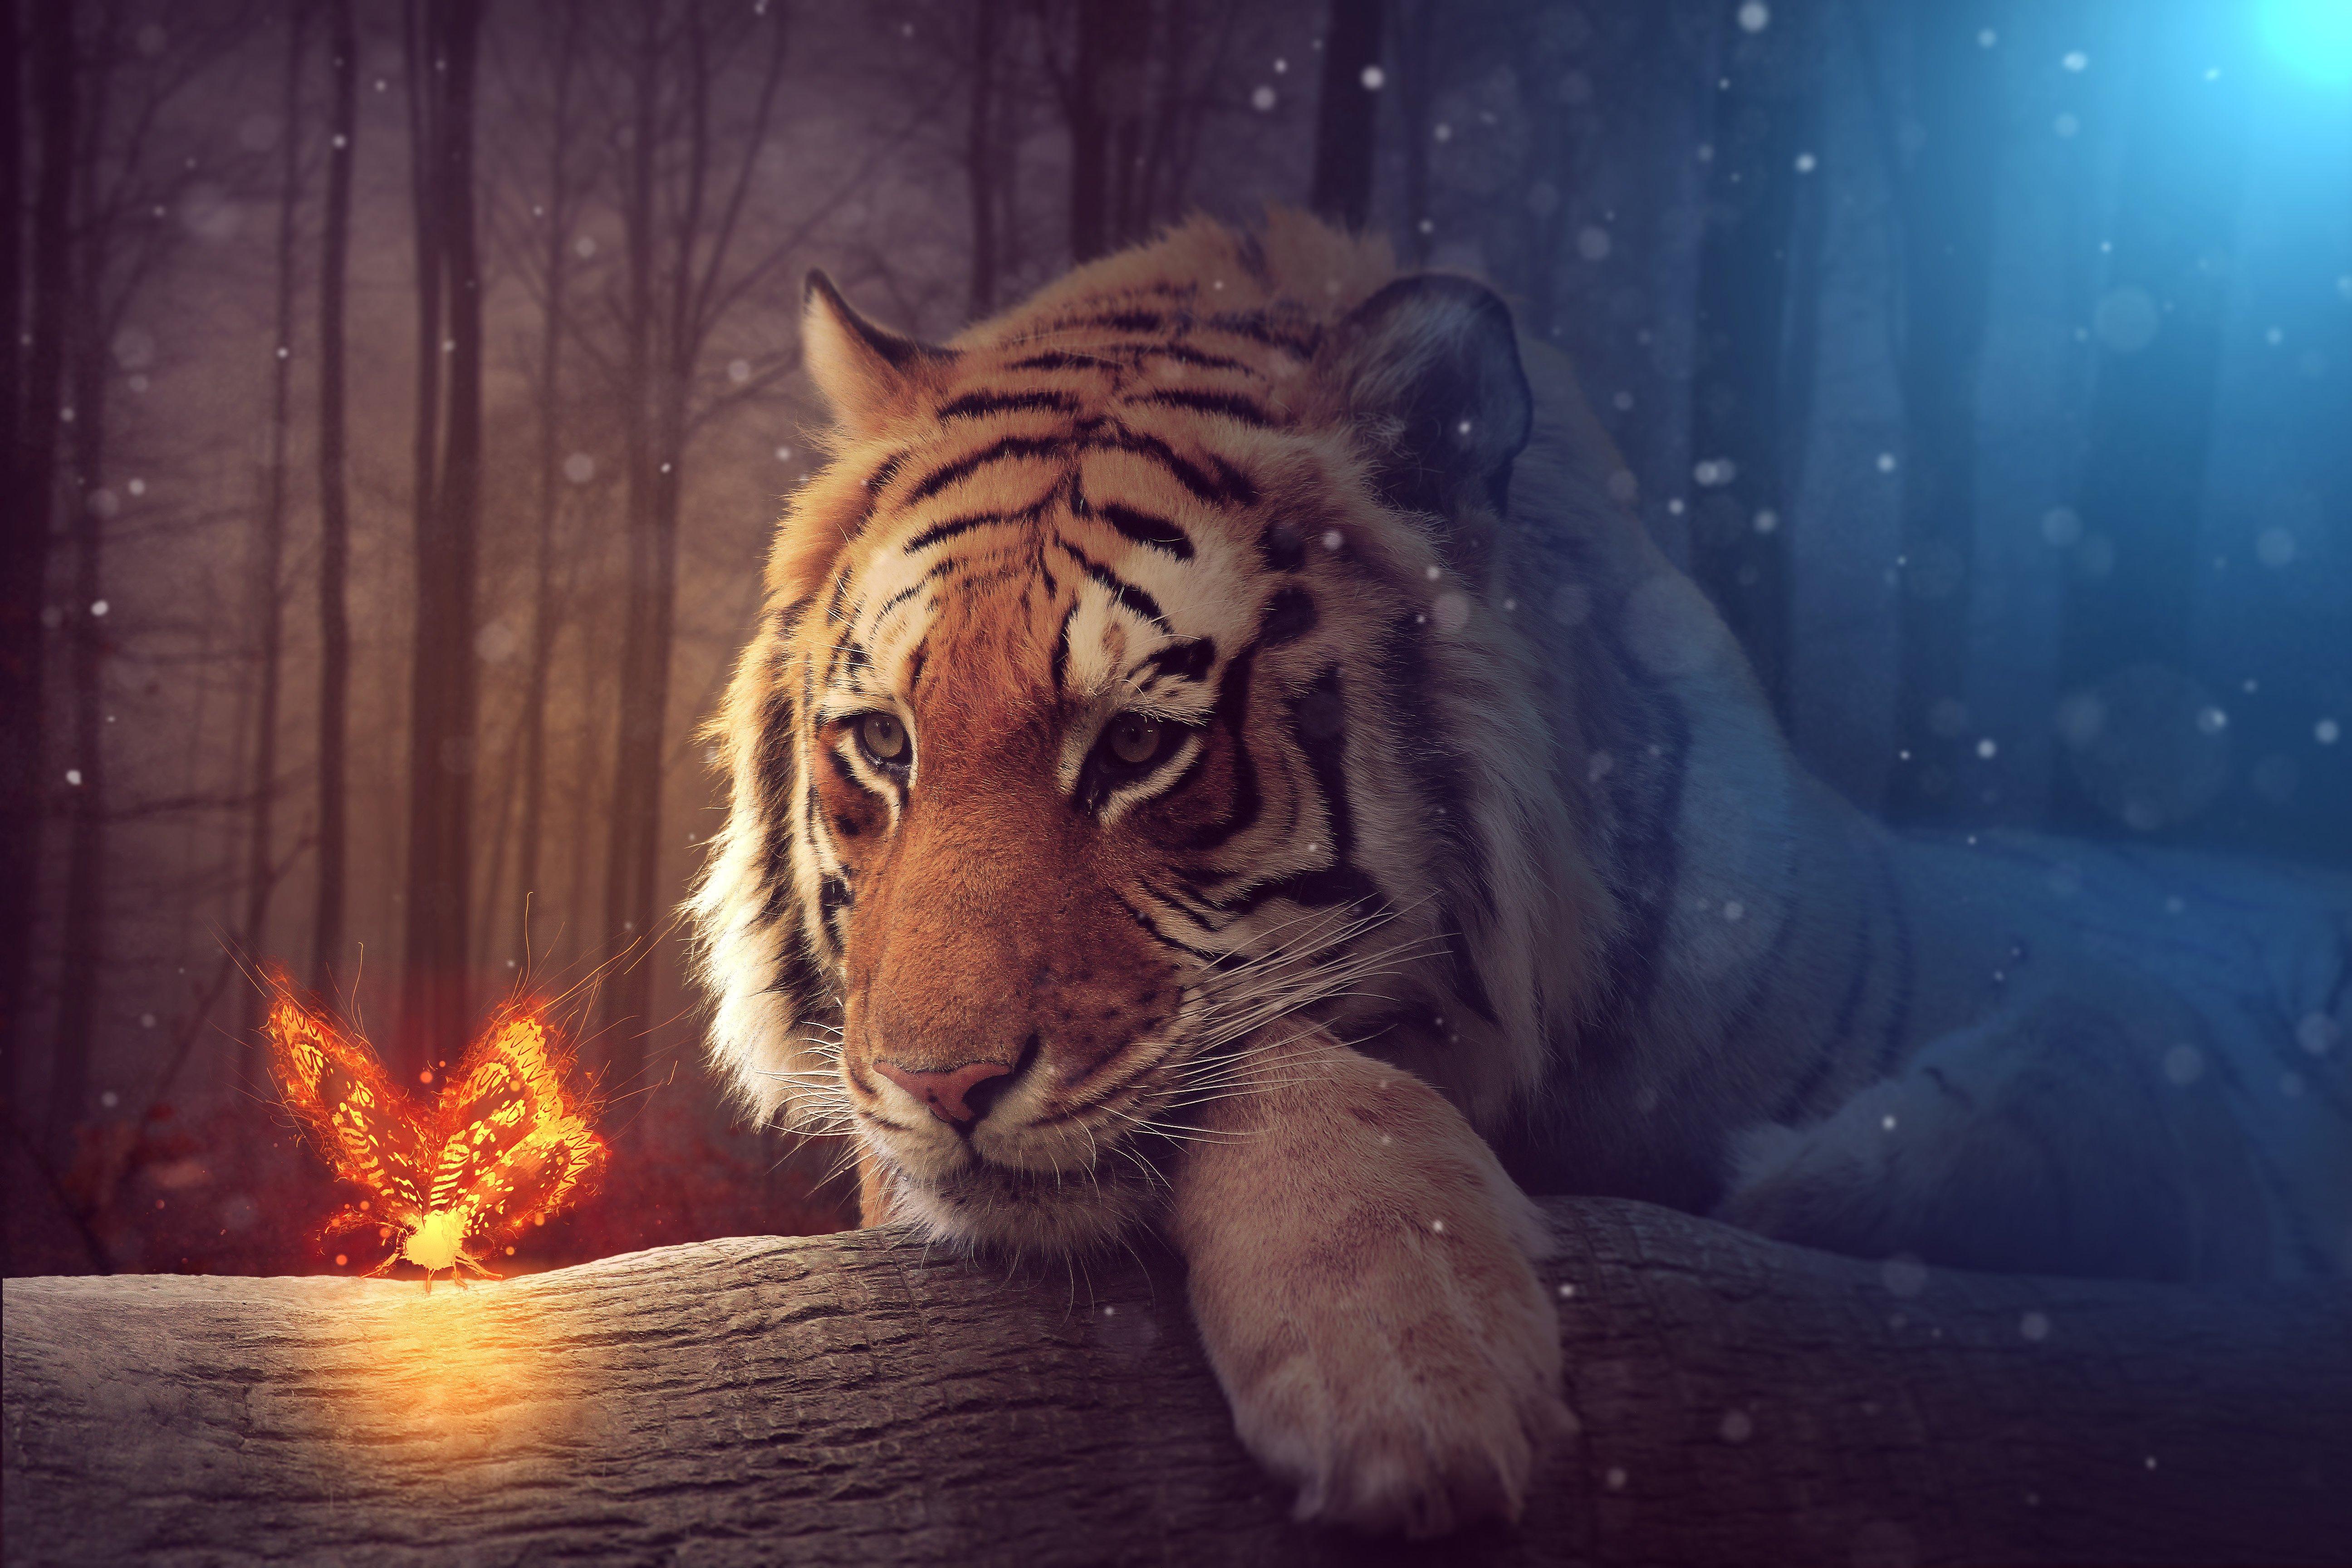 Tiger 4k Ultra HD Wallpaper Background Image 5184x3456 5184x3456